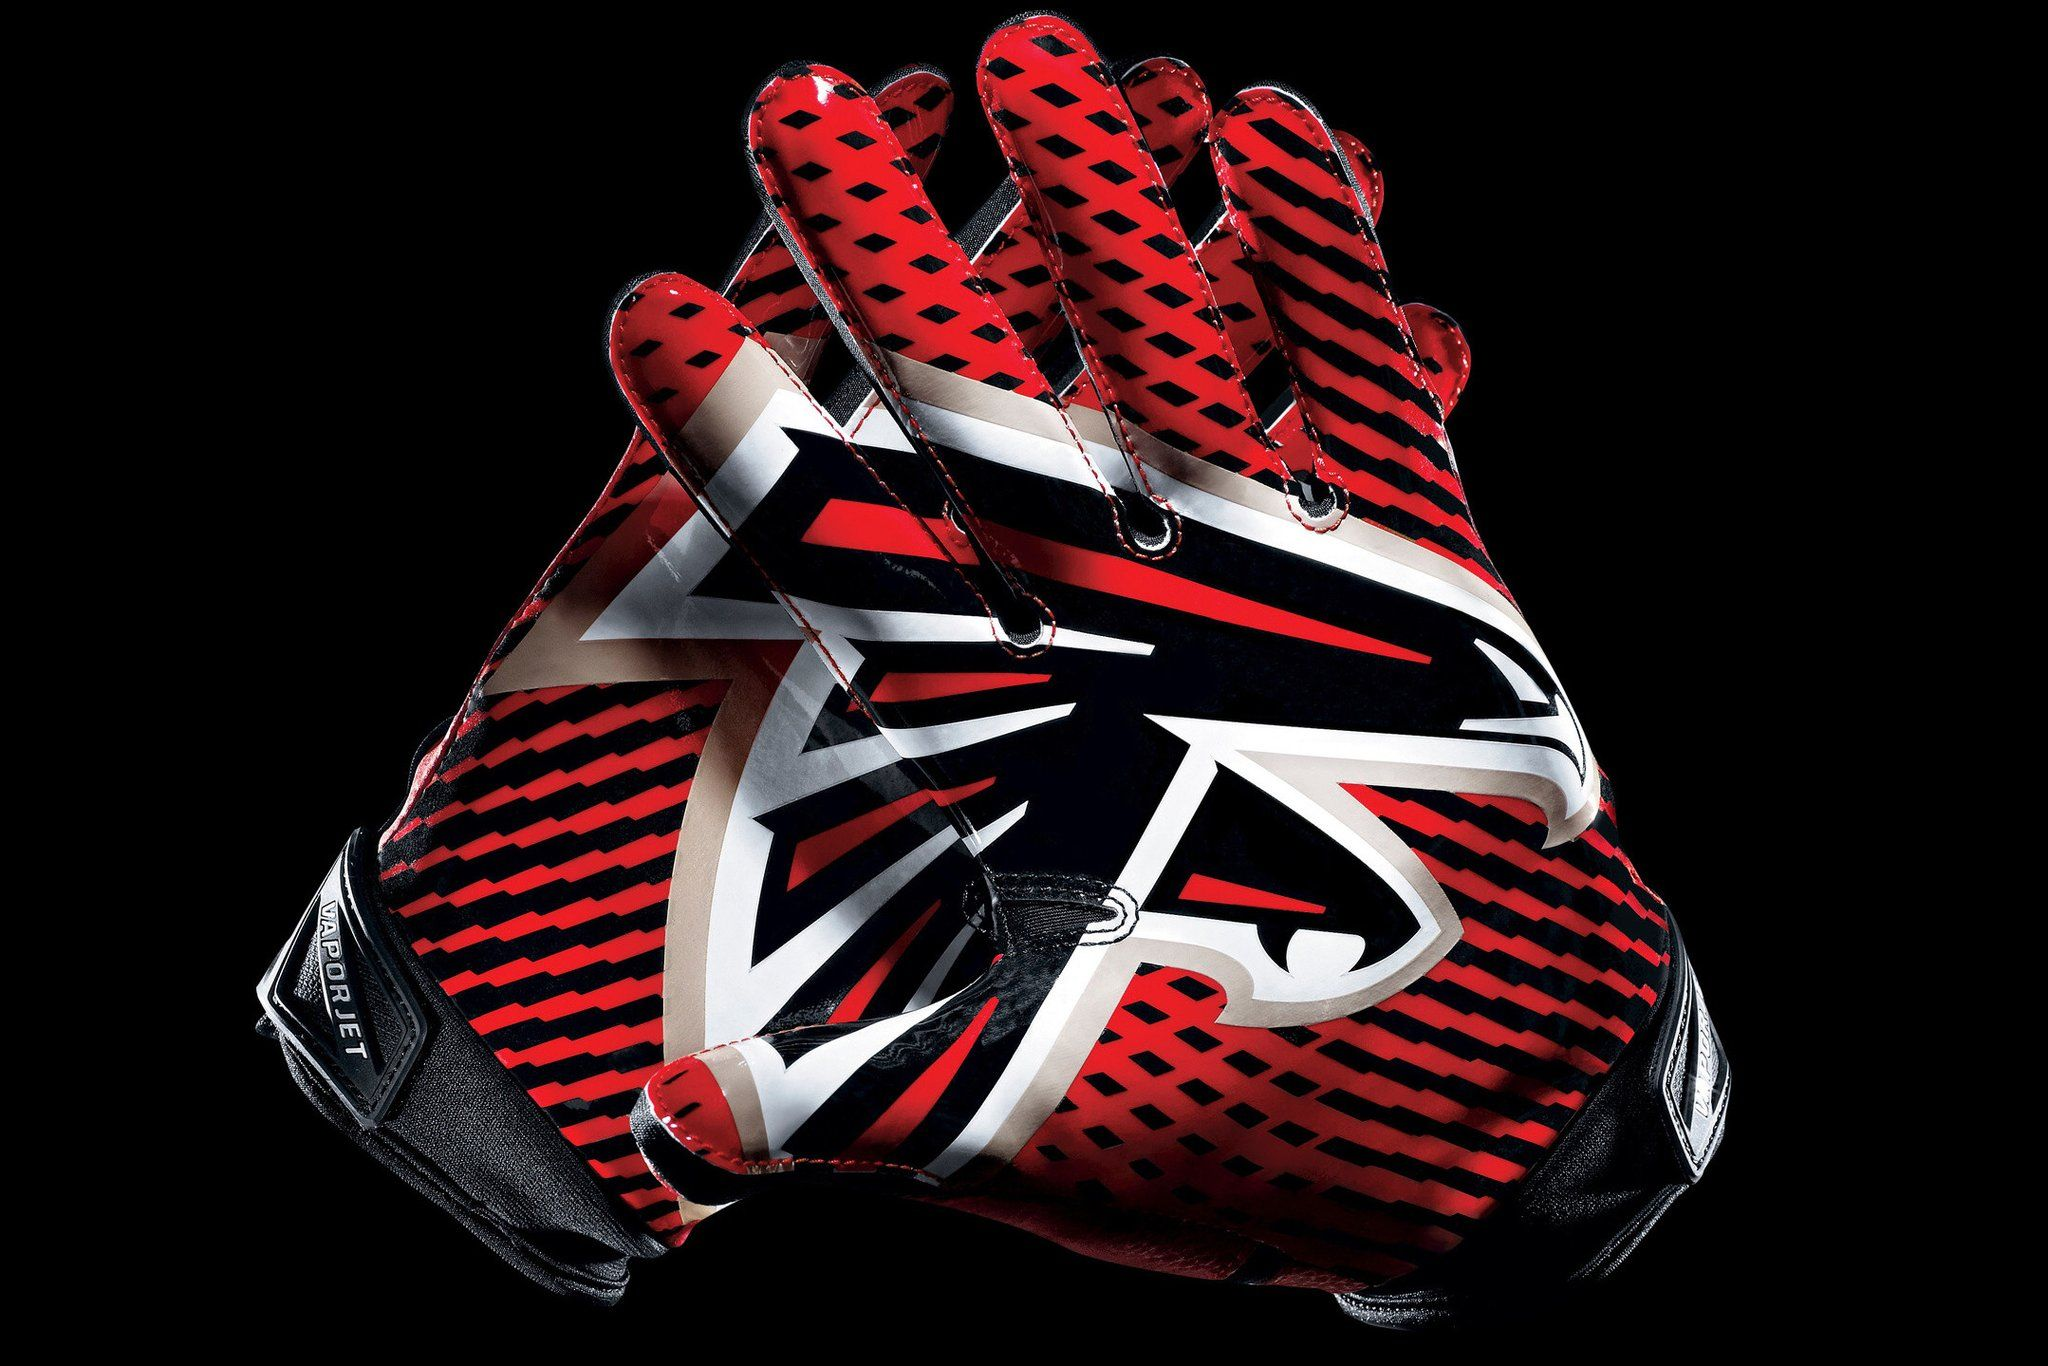 Products Diamond Painting Hut In 2020 Atlanta Falcons Football Falcons Football Atlanta Falcons Fans